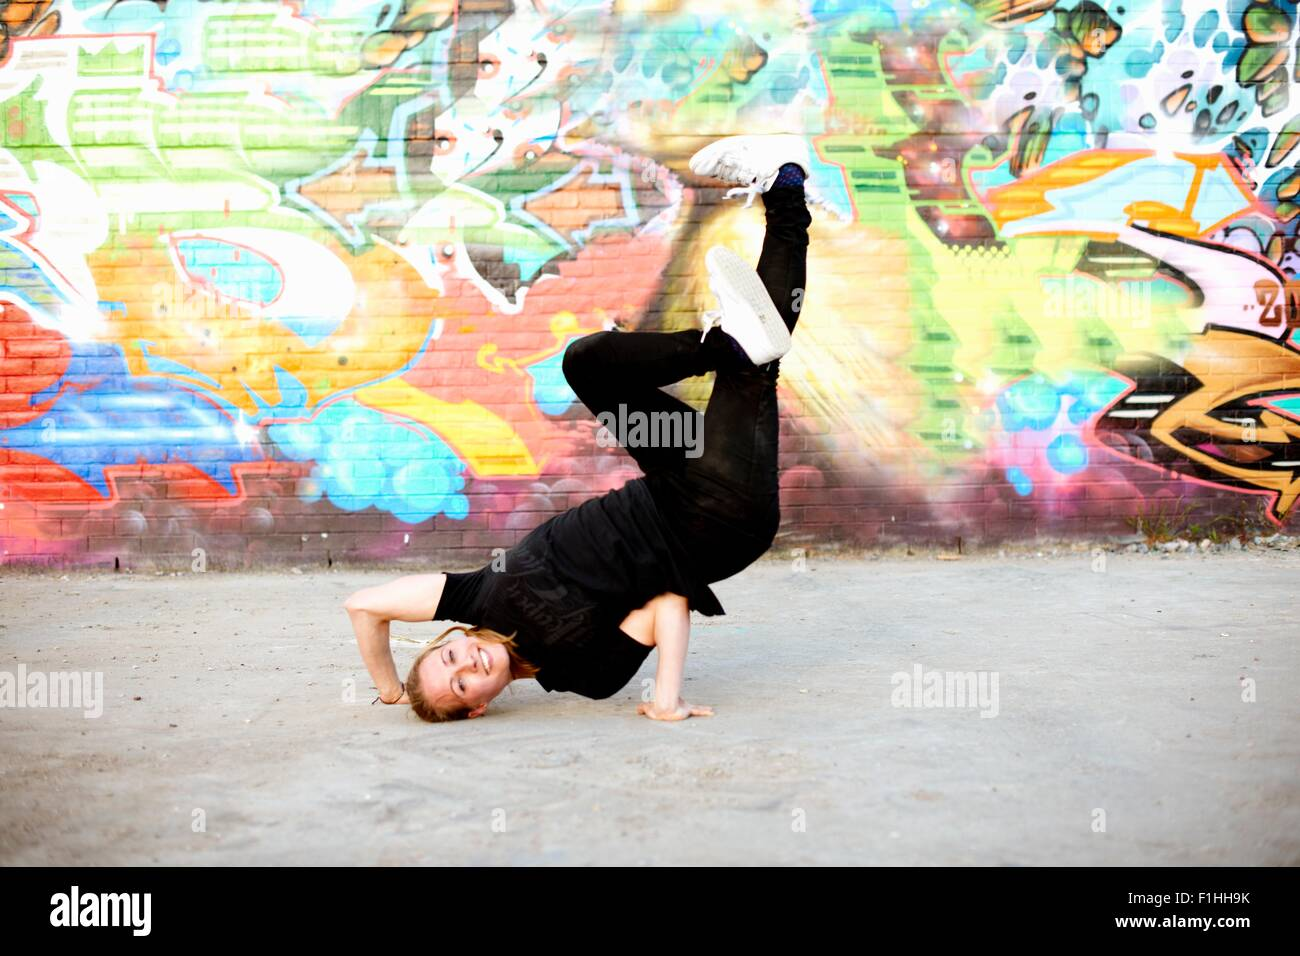 Junge Frau im Kopf Breakdance Einfrieren gegen graffiti Stockbild